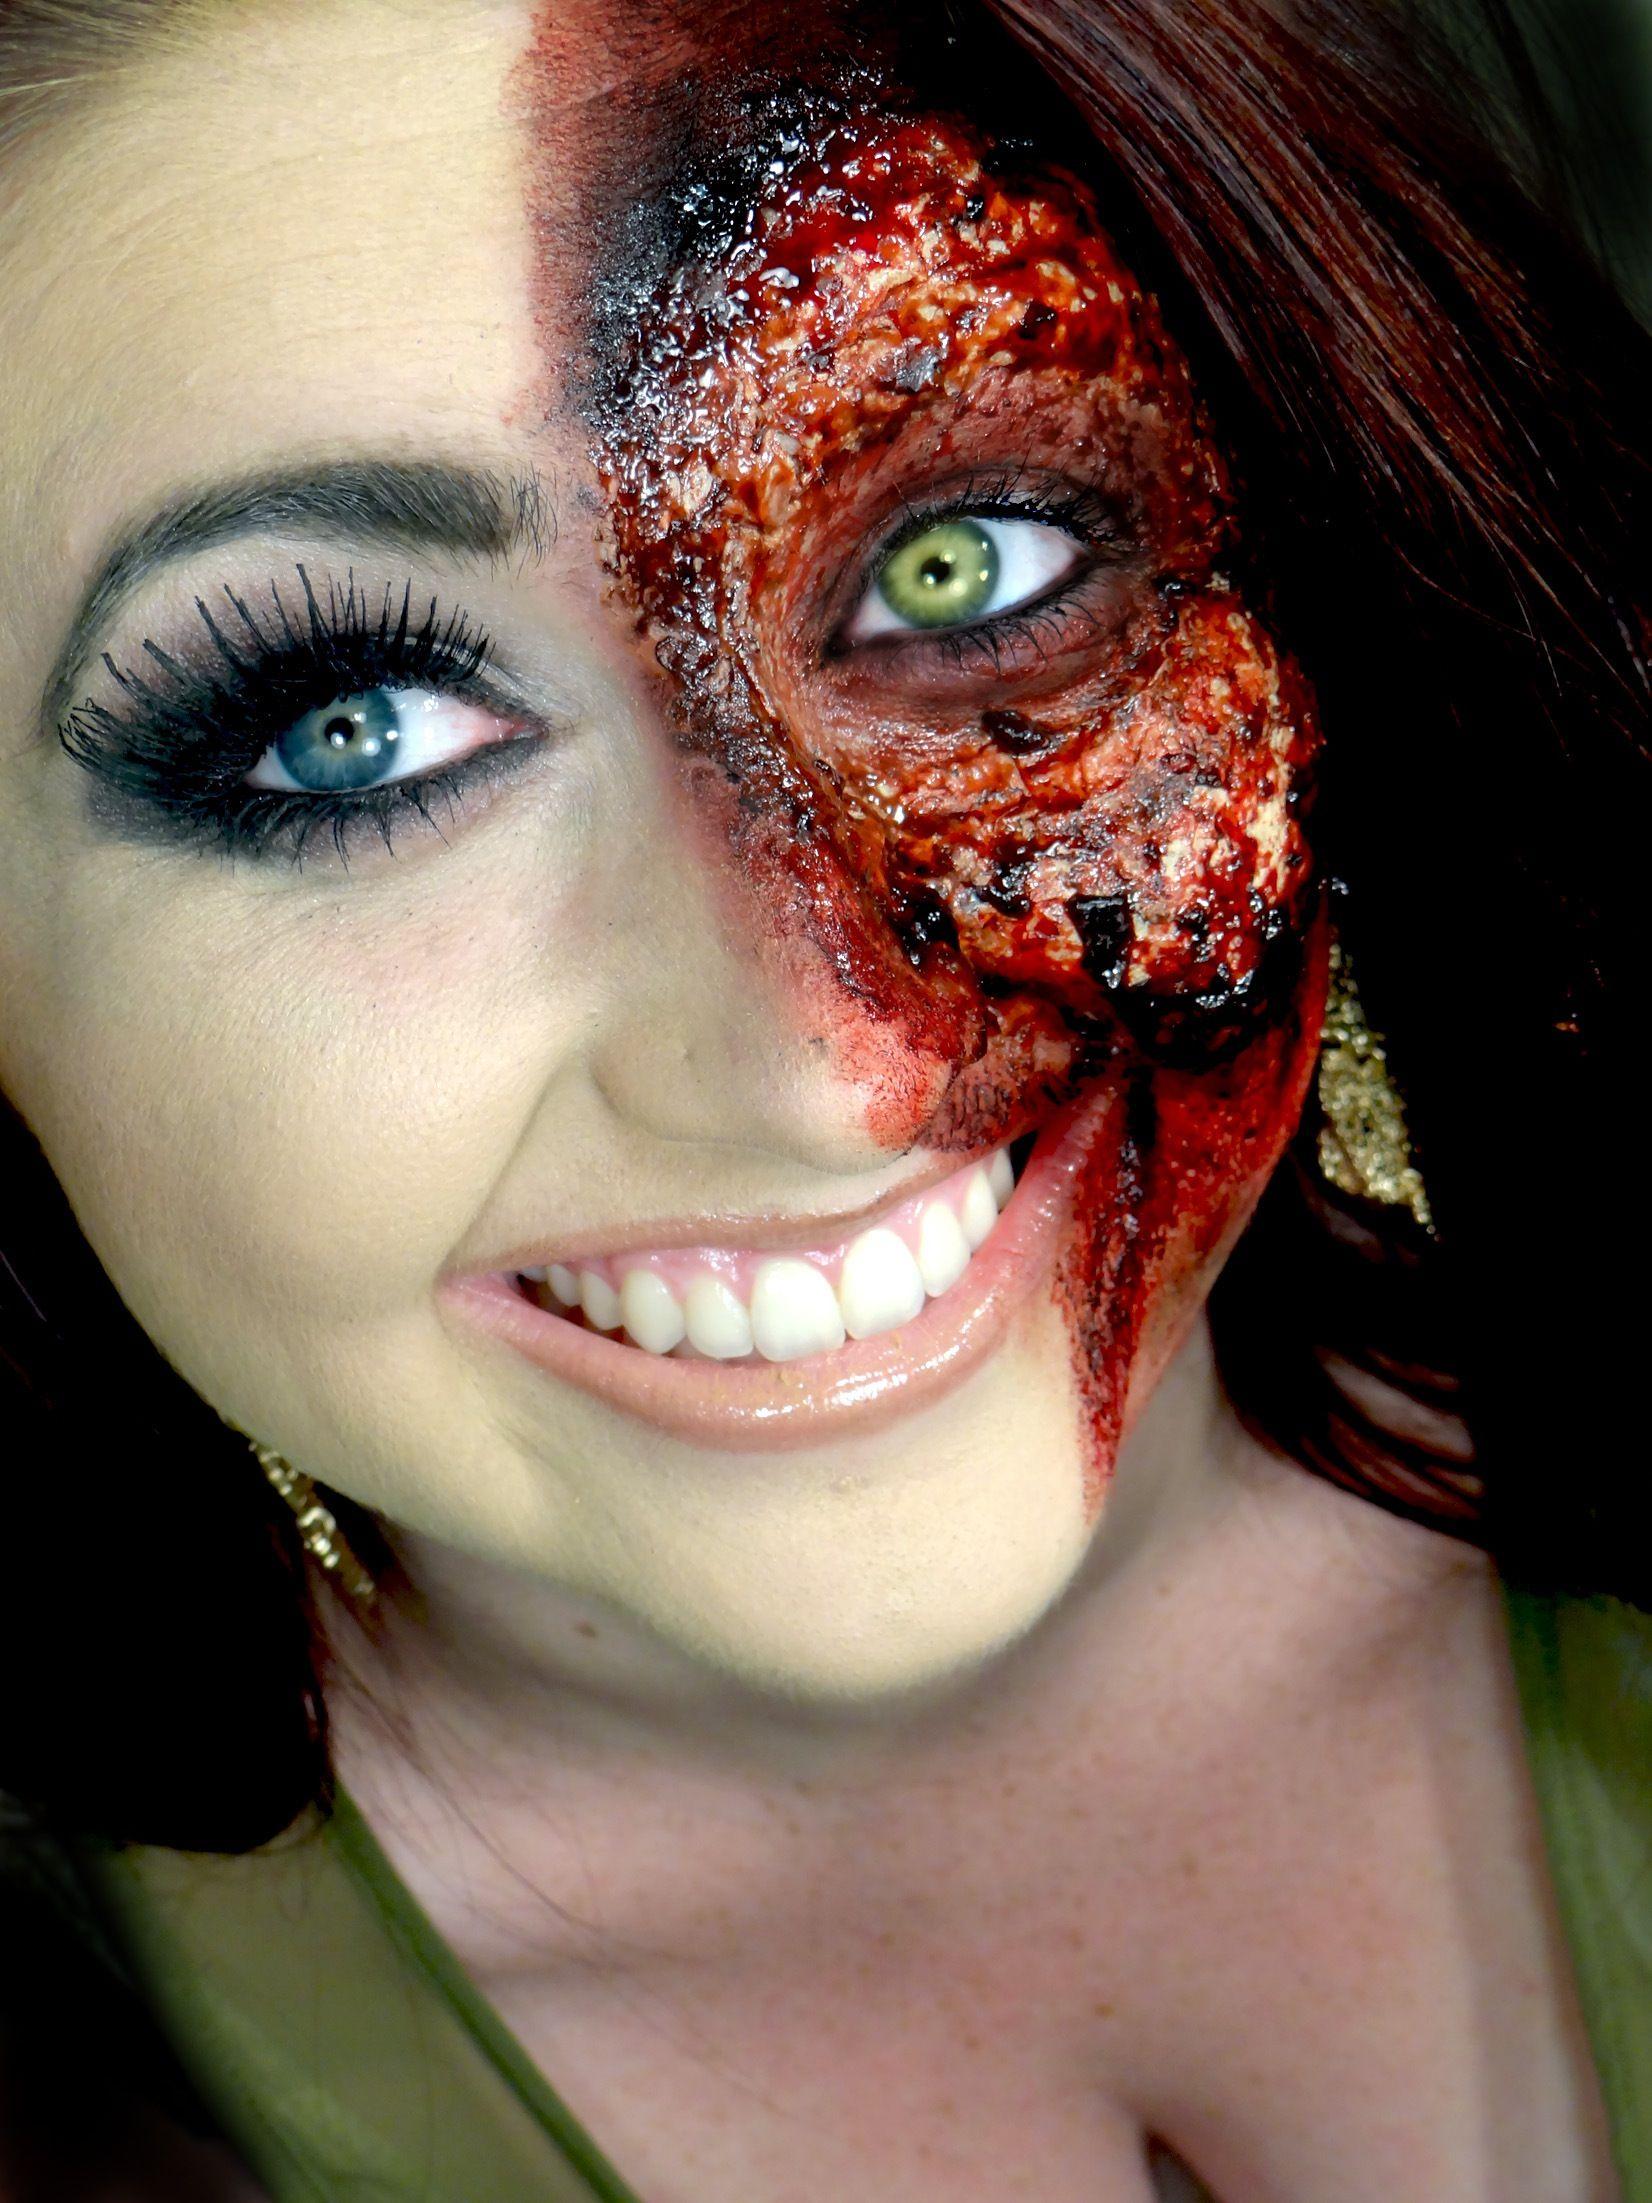 Bloody Halloween makeup | Costume ideas | Pinterest | Bloody ...